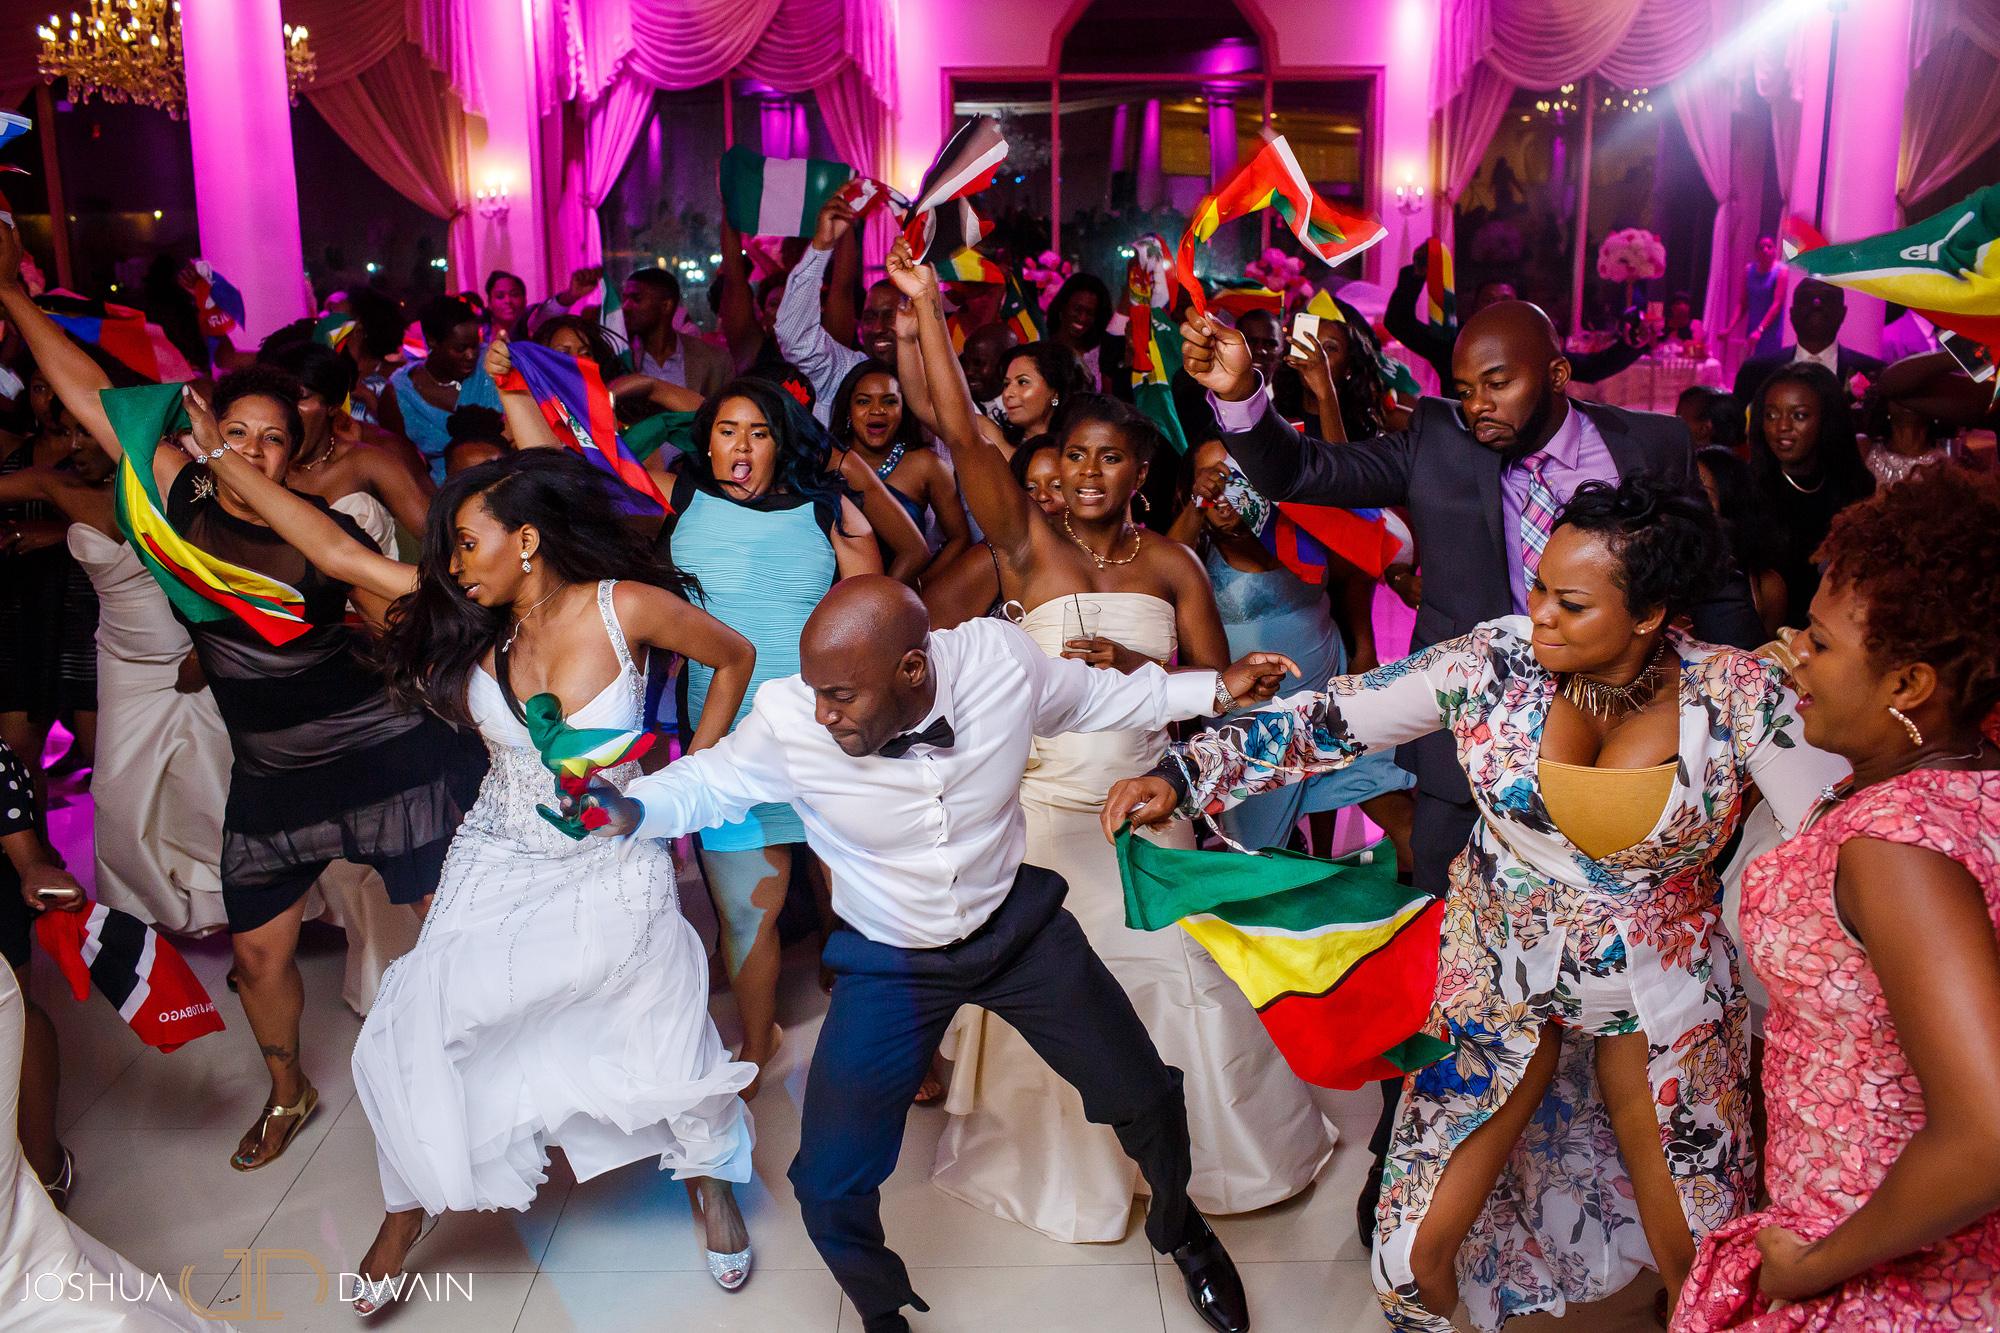 victorious-events-nyc-034-alana-vibert-greentree-country-club-wedding-joshua-dwain.jpg